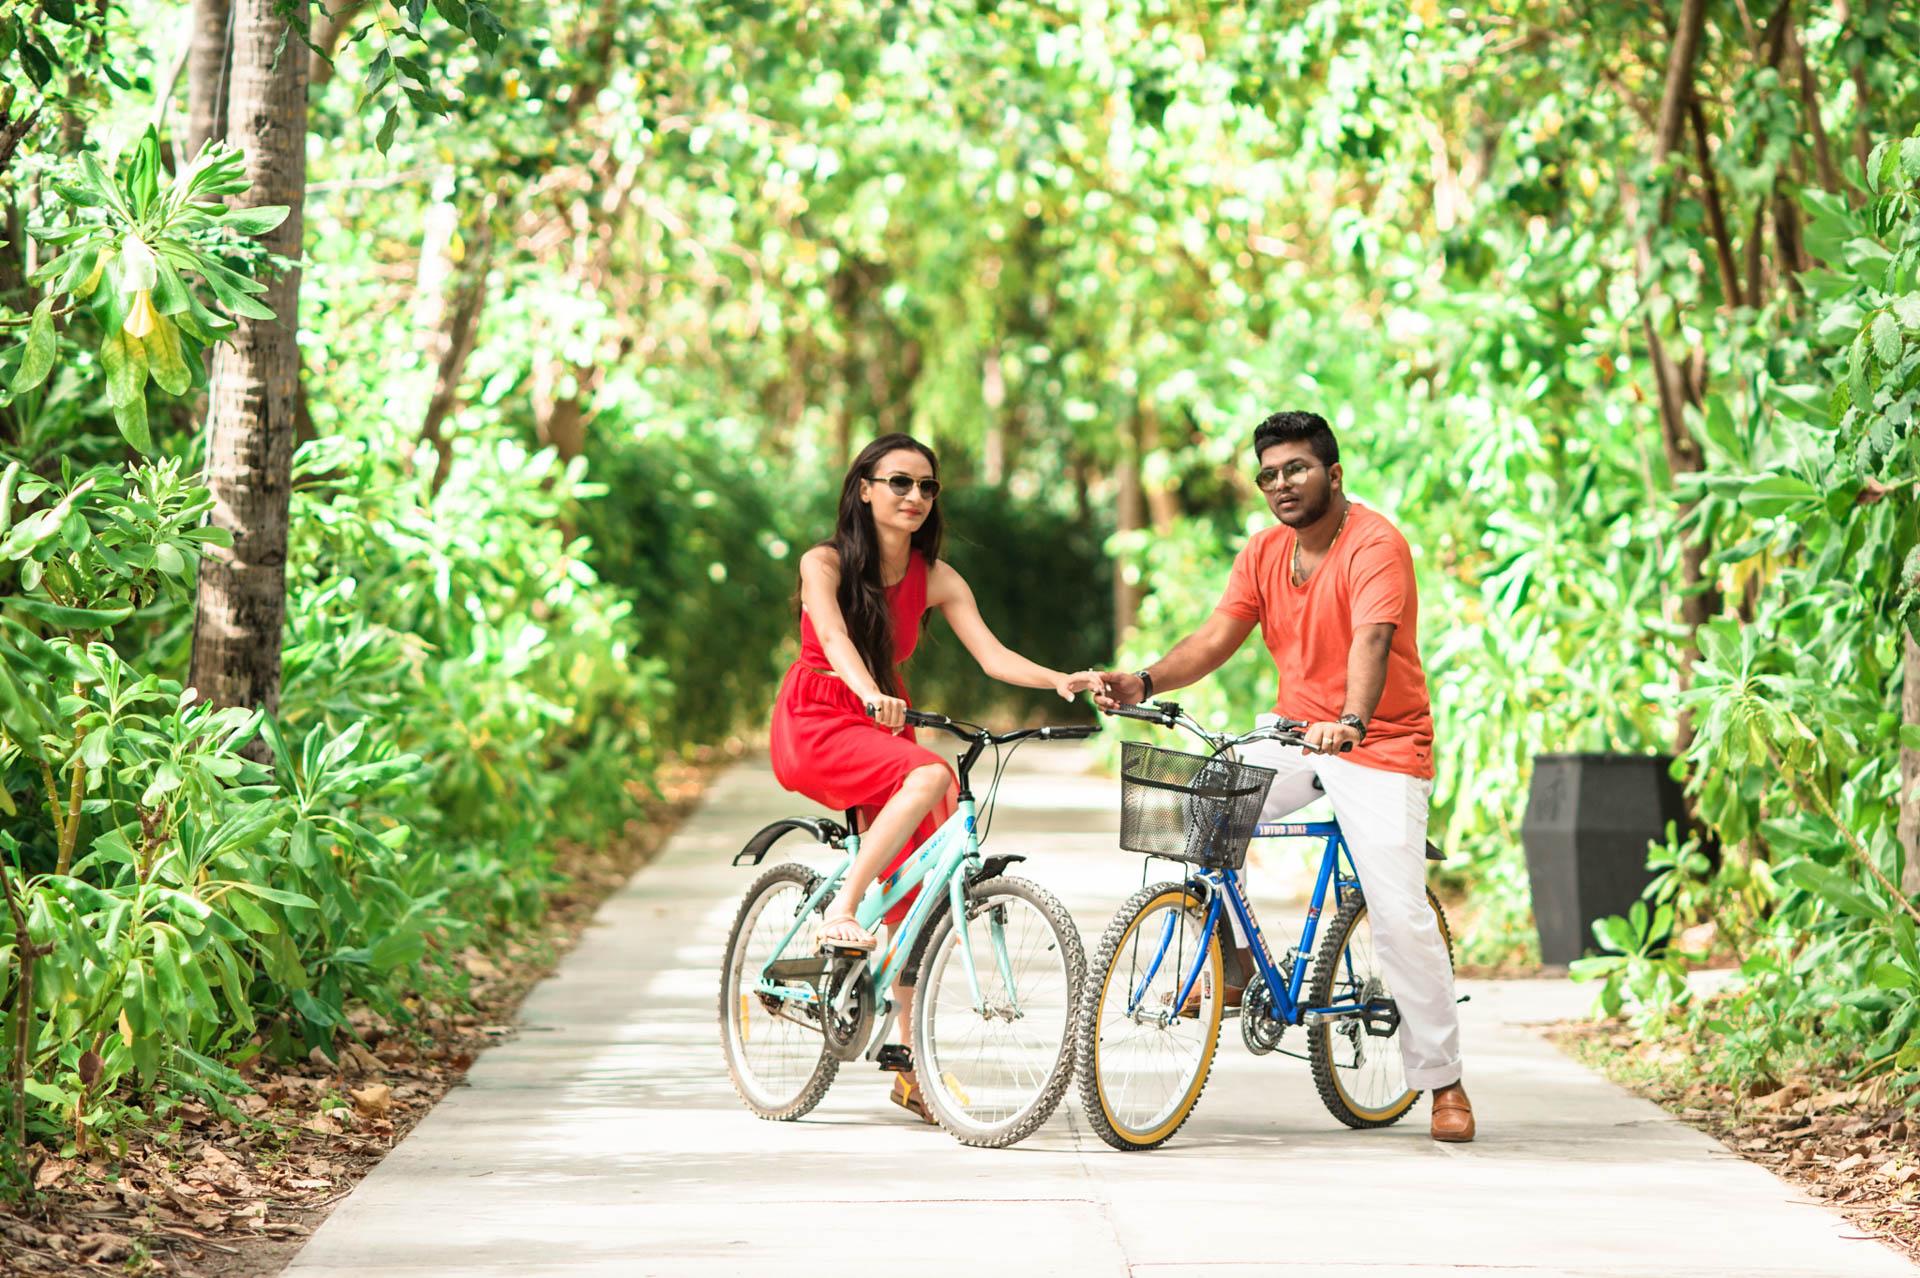 Abhijit Meghna Romantic Vacation in Maldives 26